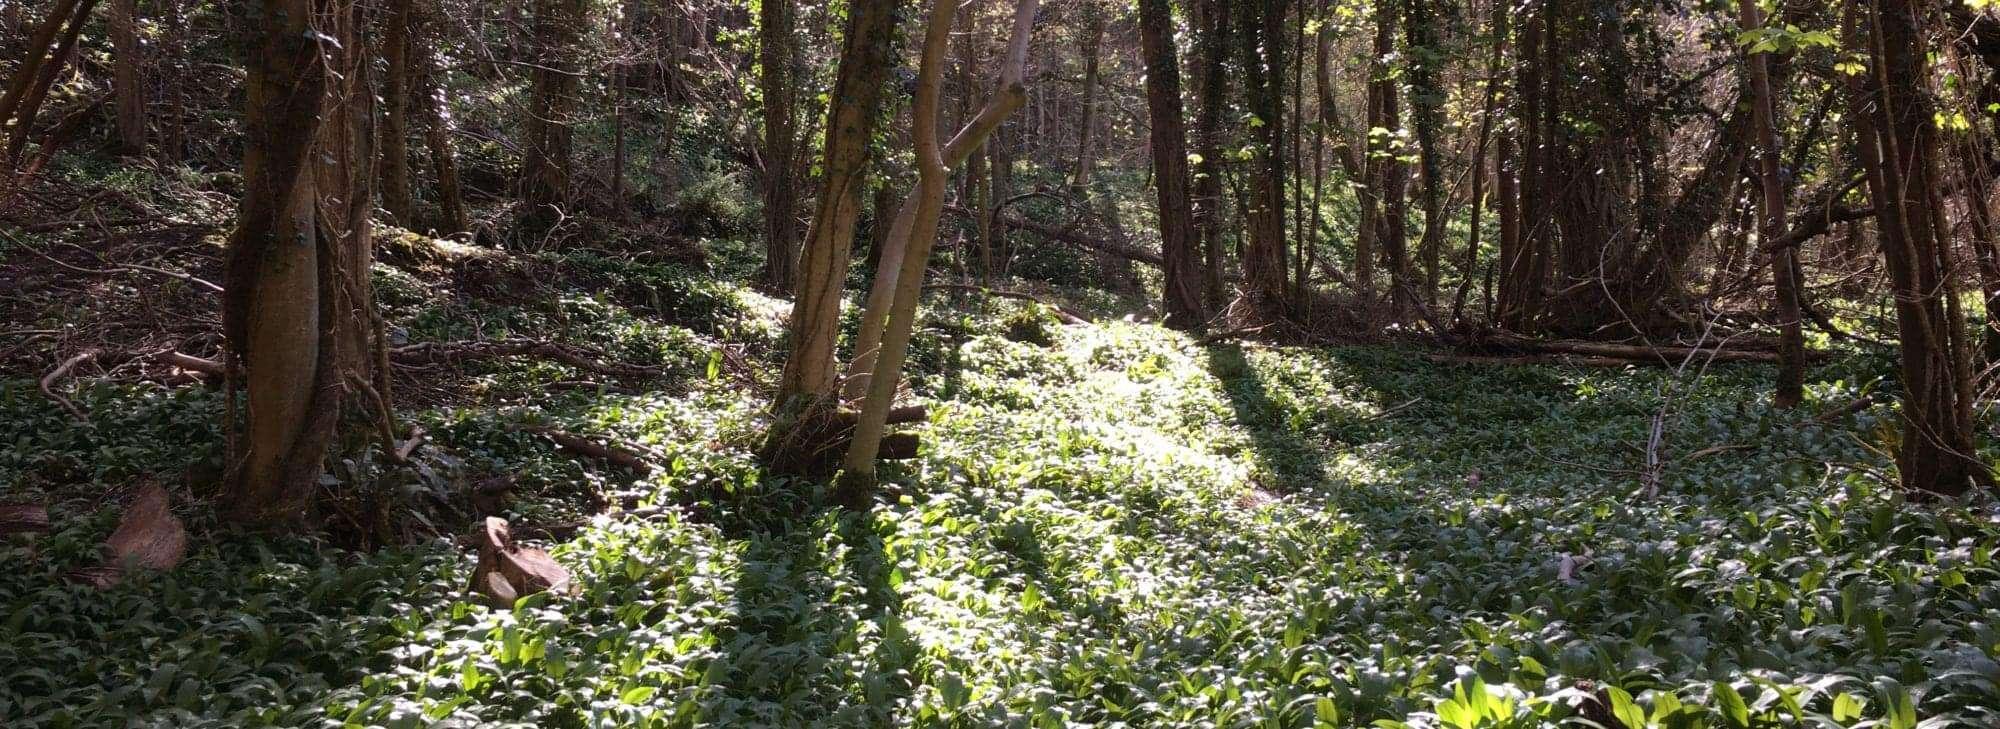 Sunlight peeking through the Wye Valley Glade